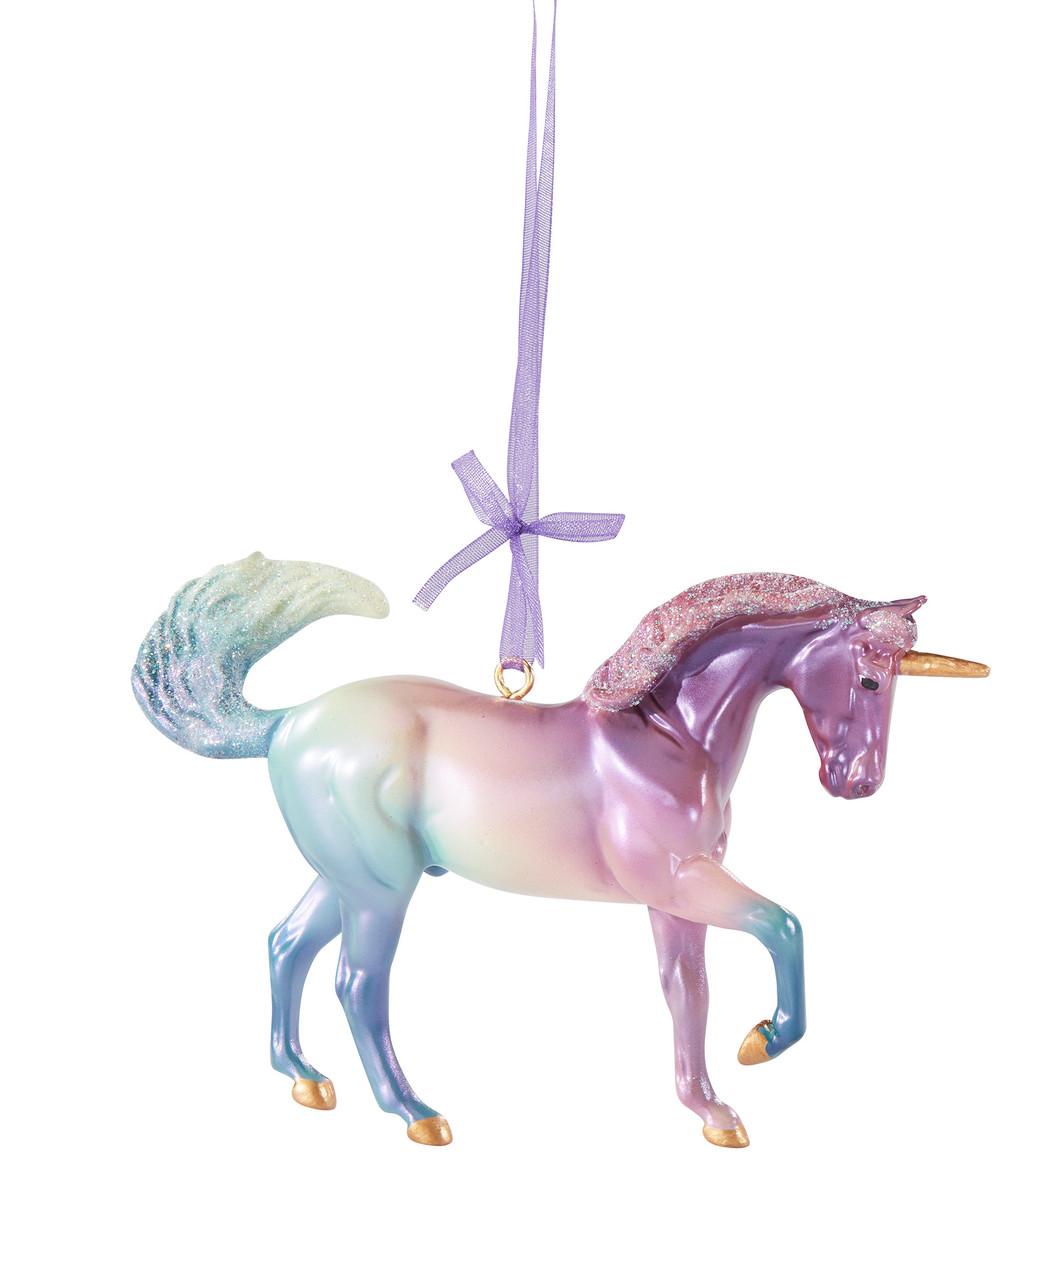 Breyer Horses 2020 Holiday Cosmo Unicorn Ornament Golden Oak Stables